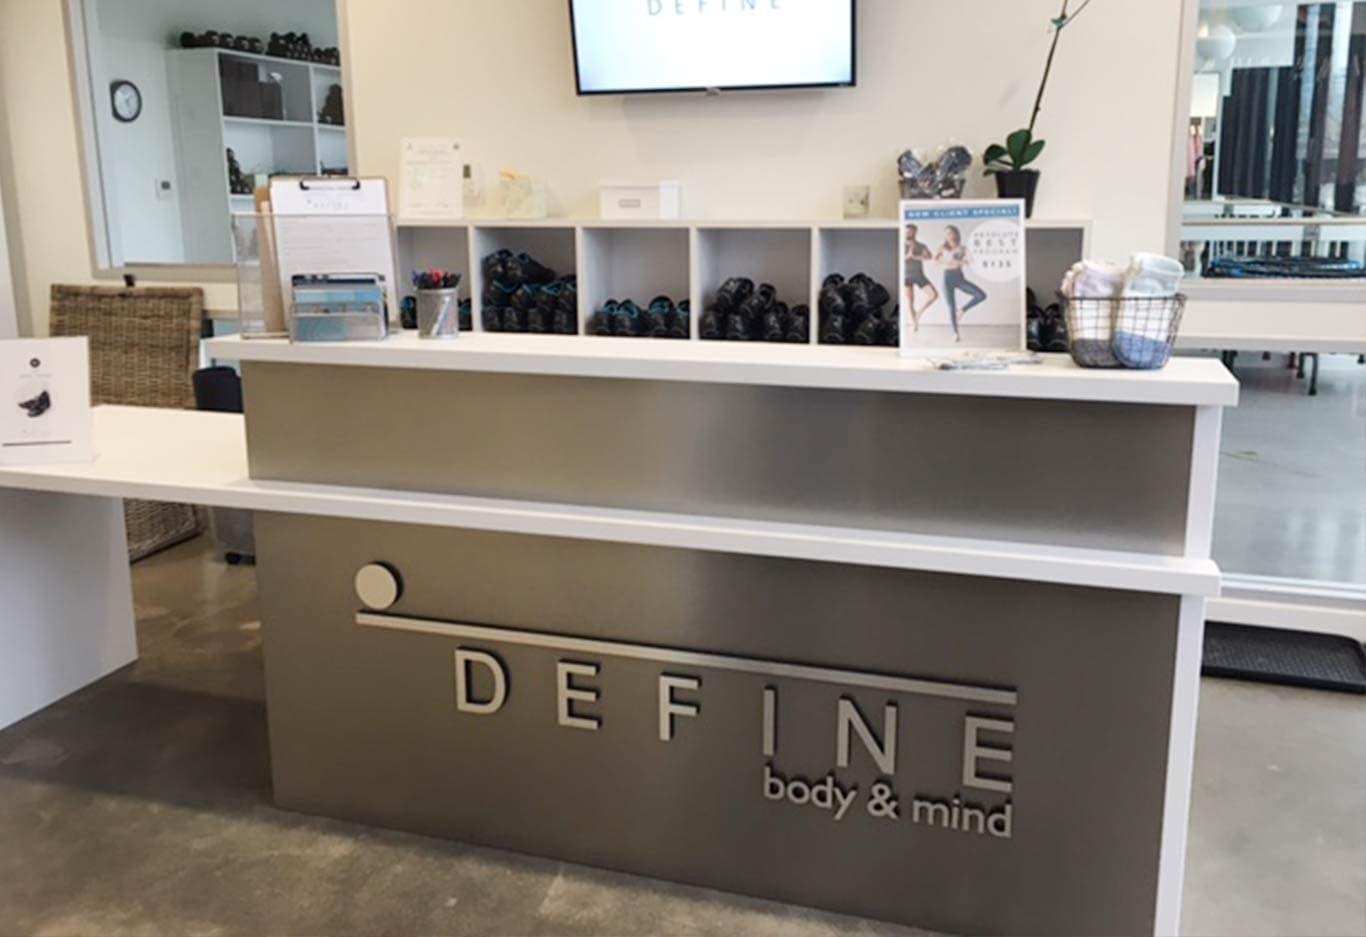 DEFINE body Denver